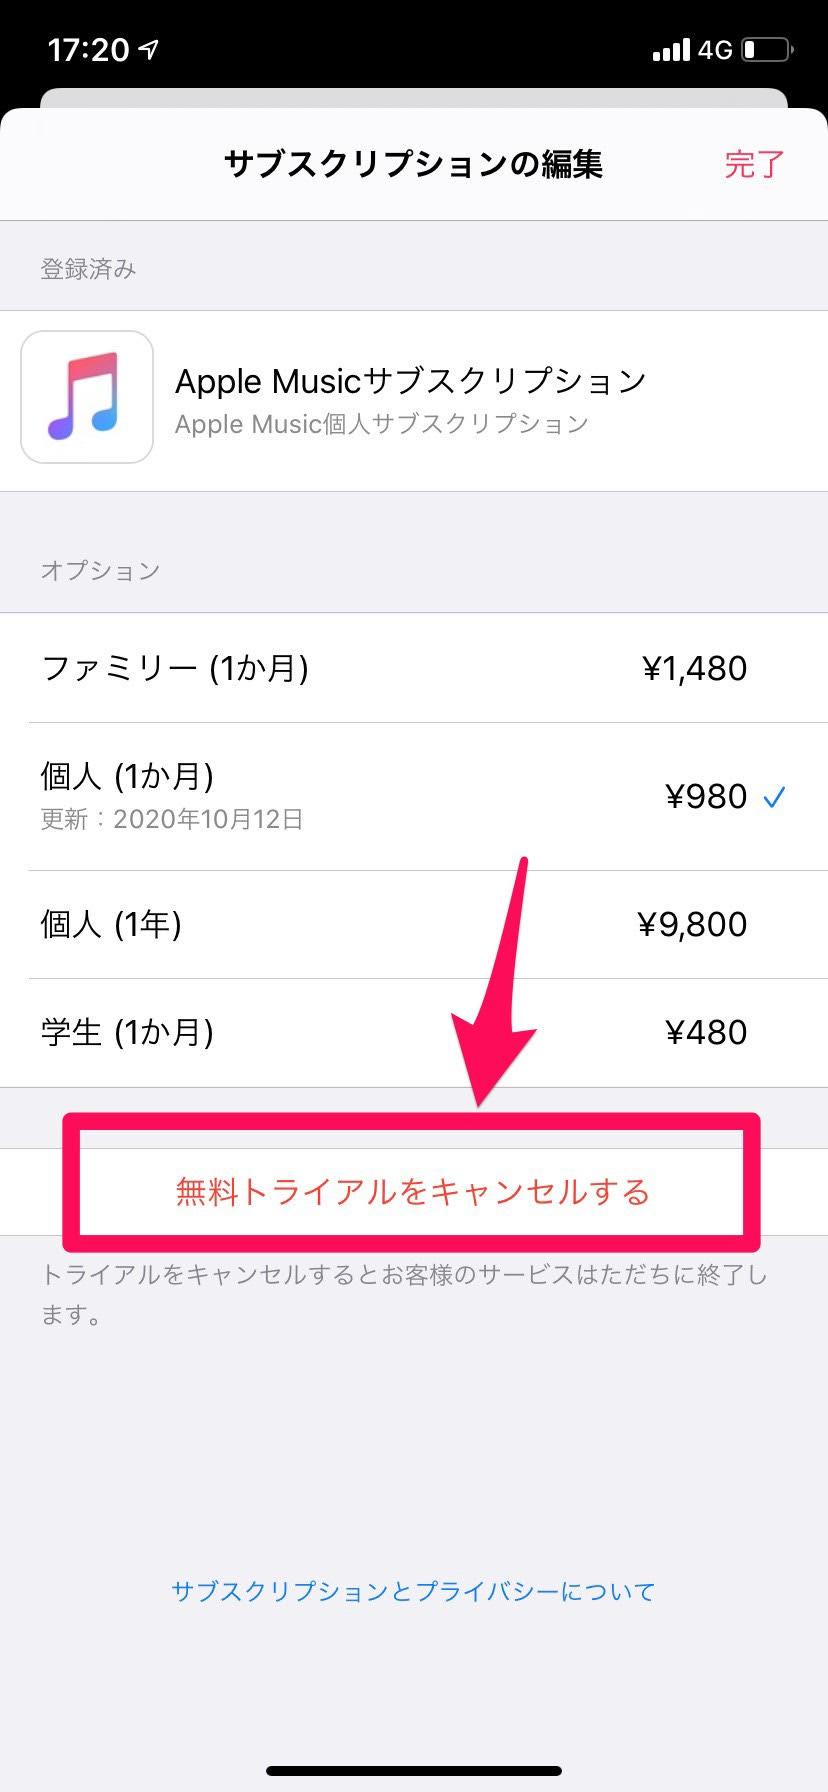 Apple MusicをiPhoneで解約する方法